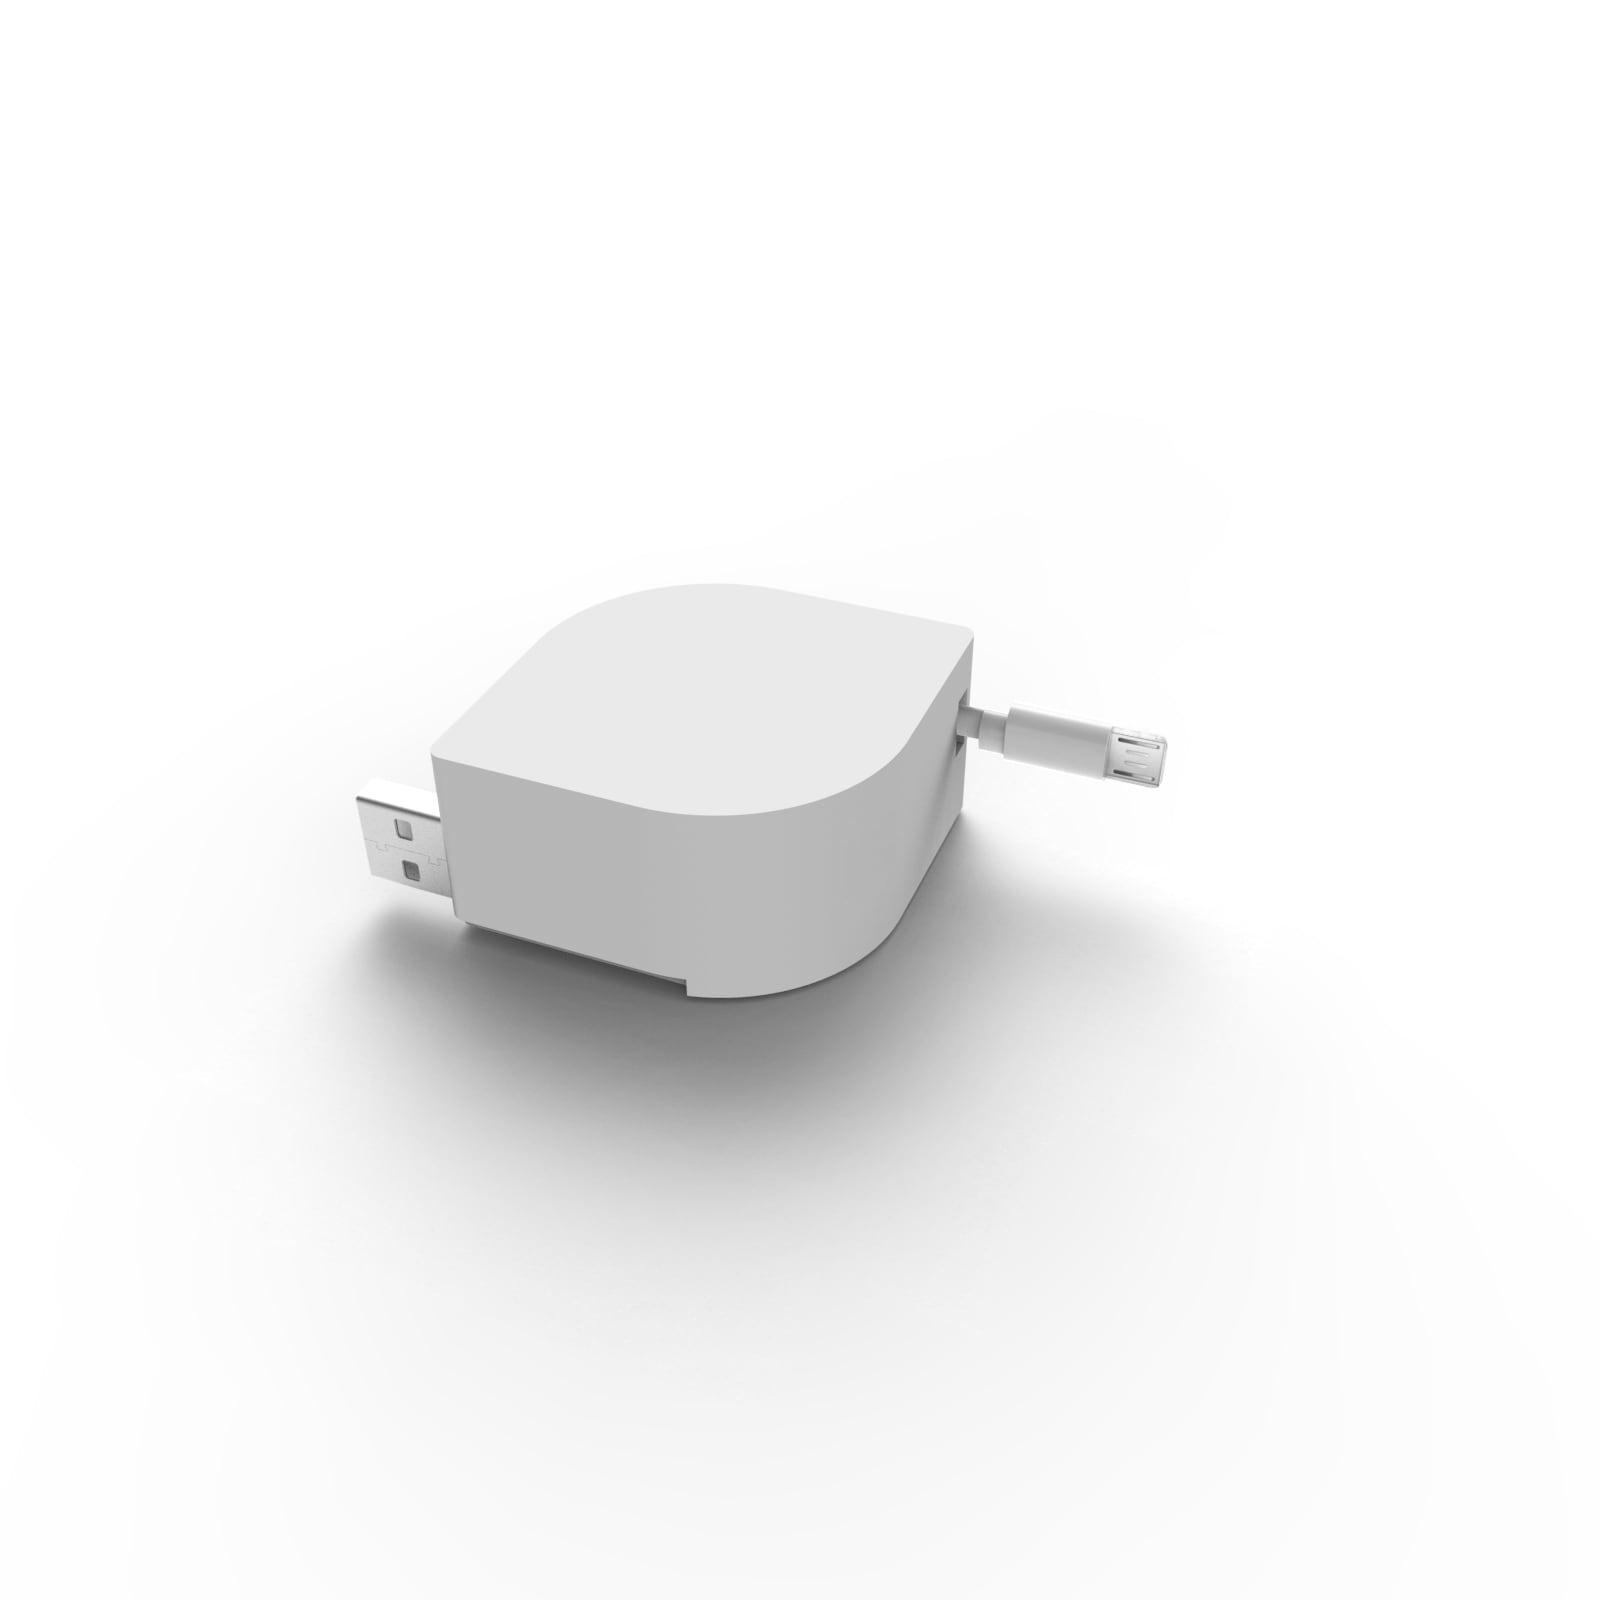 North Retractable Micro-USB Pod For Charging Dock, White, 813125026158